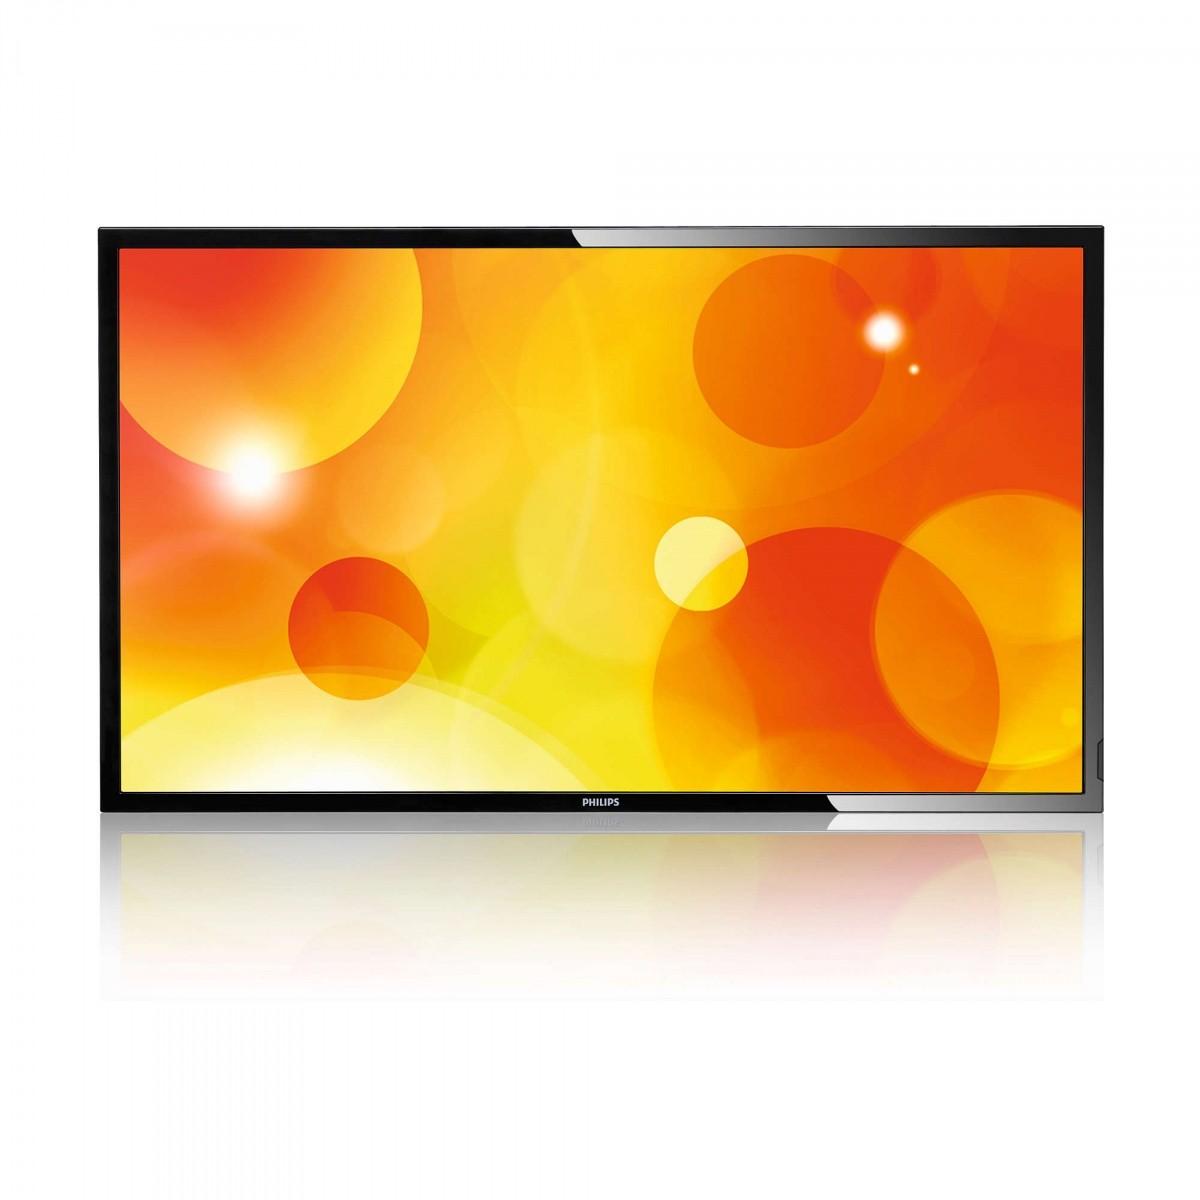 Velkoformátový LED displej Philips BDL4330QL